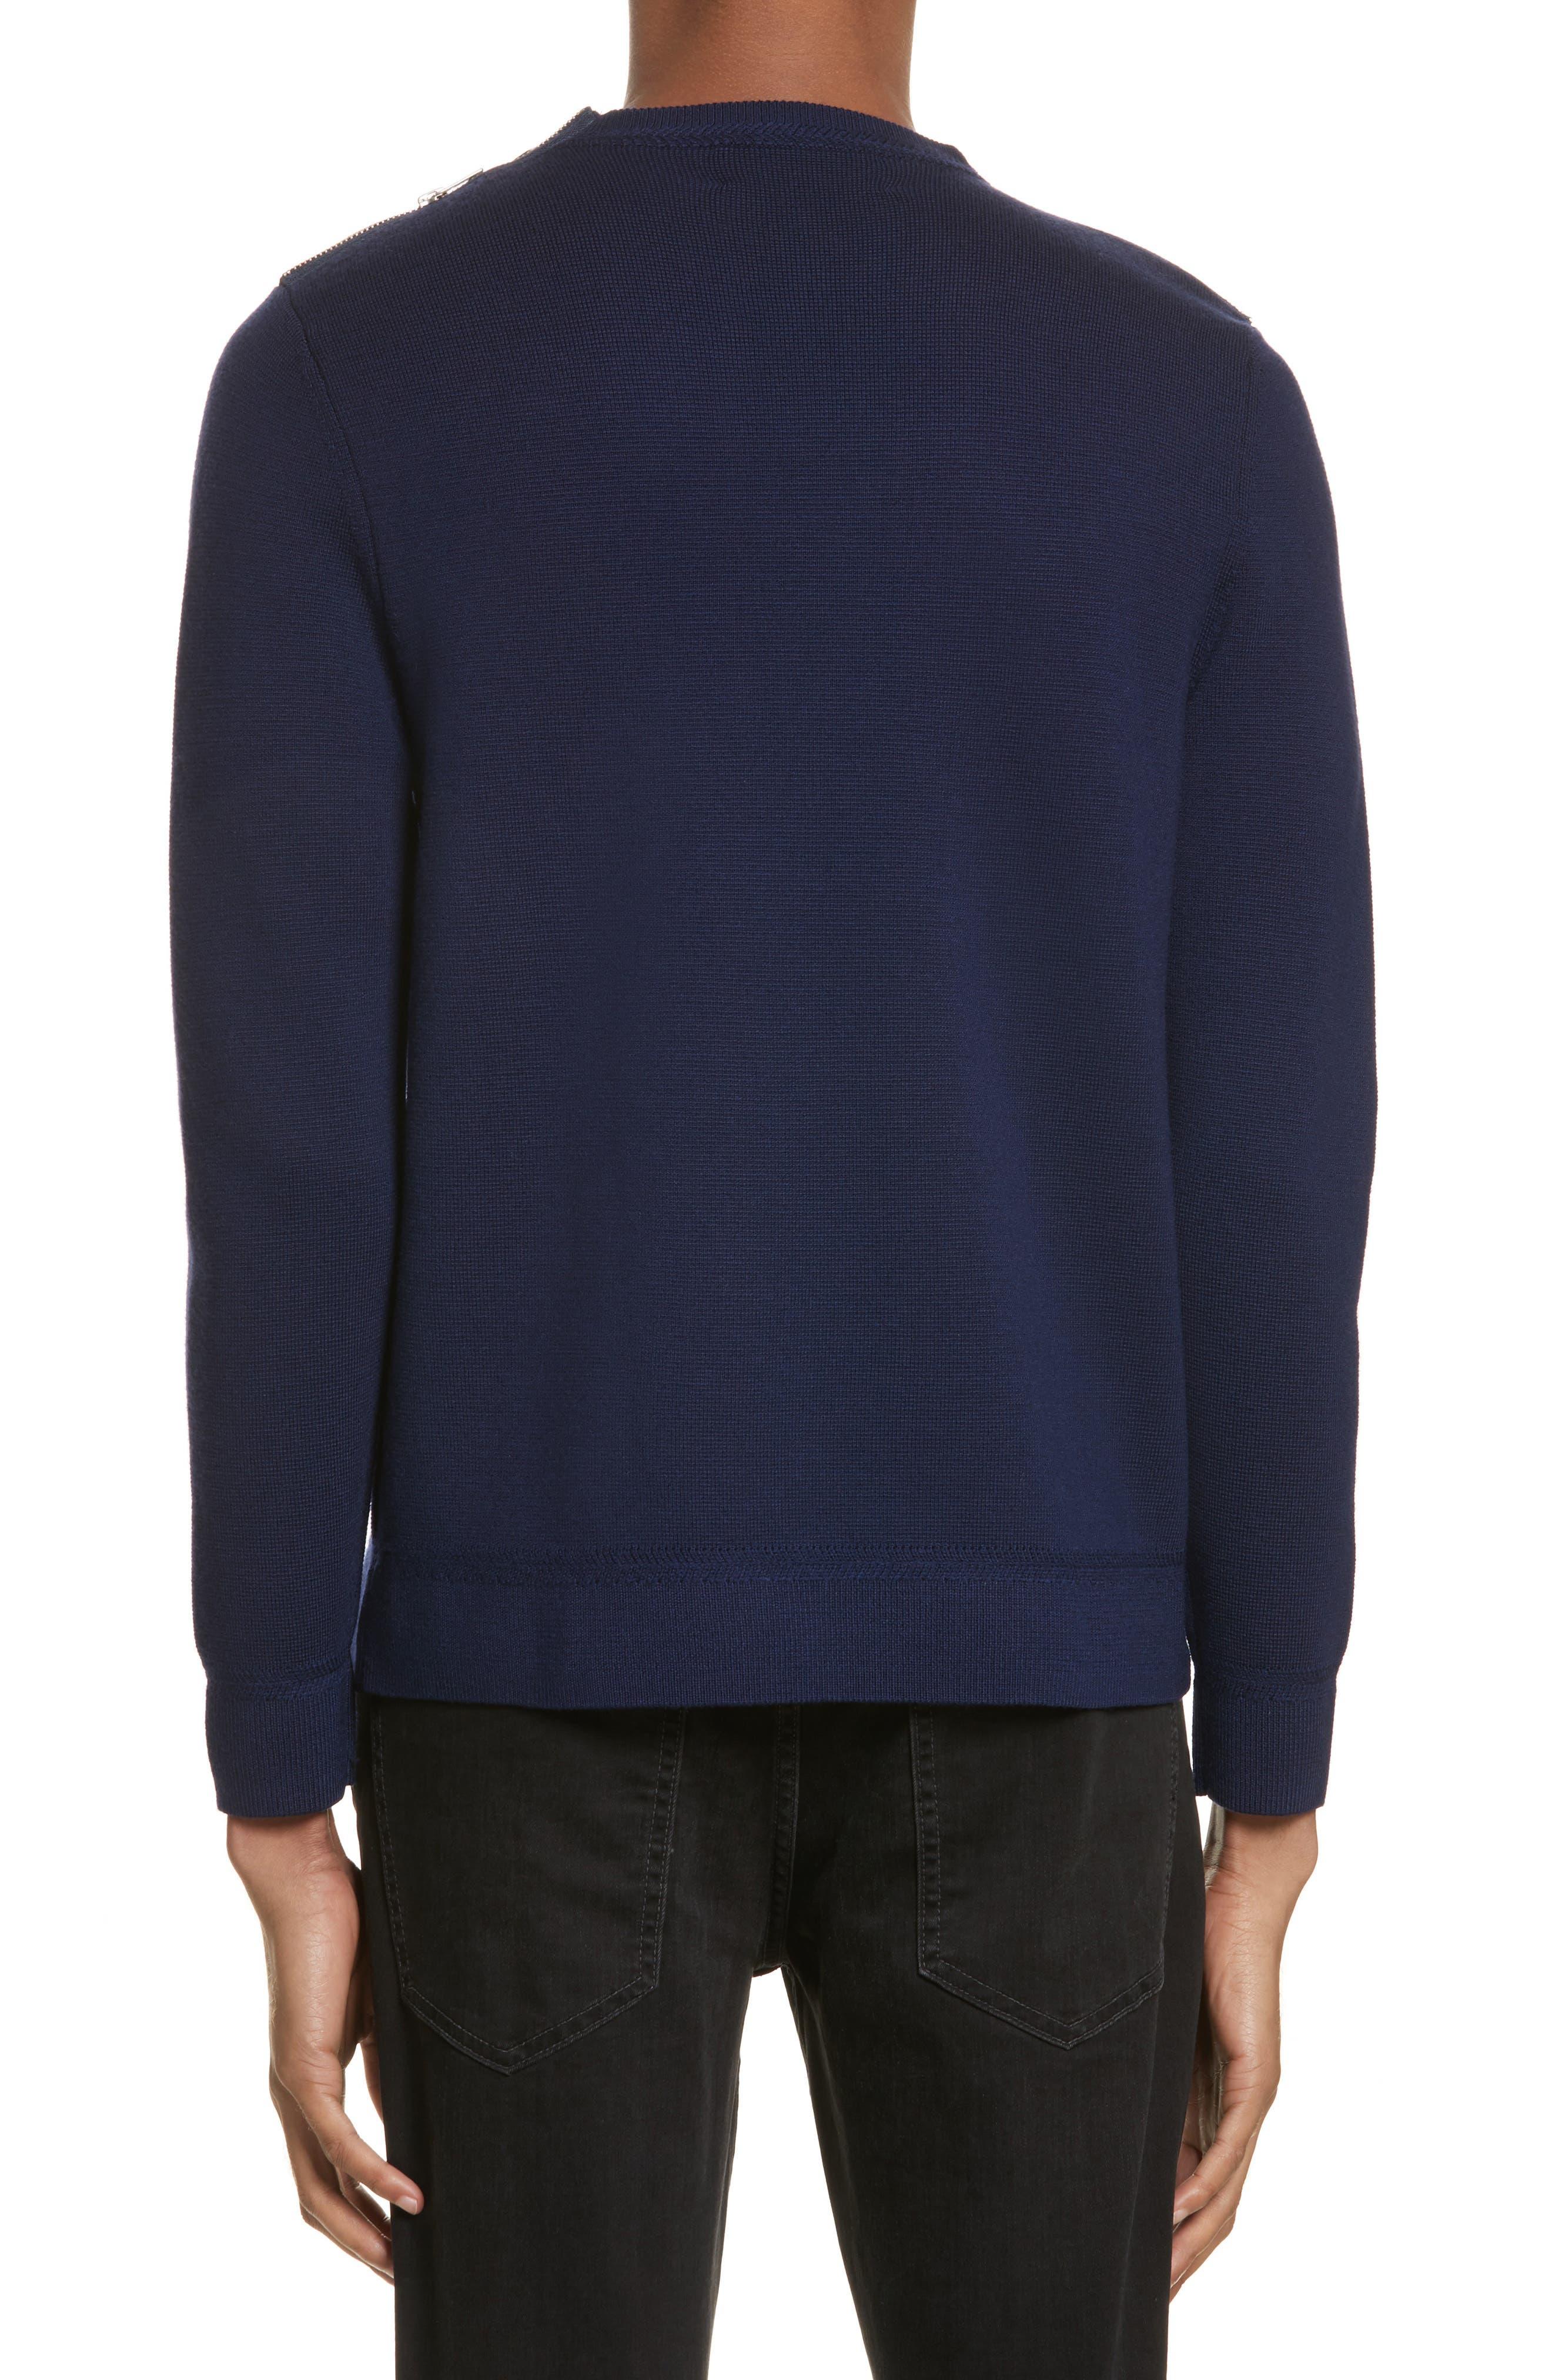 Merino Wool Blend Sweater with Shoulder Zip Trim,                             Alternate thumbnail 2, color,                             Navy